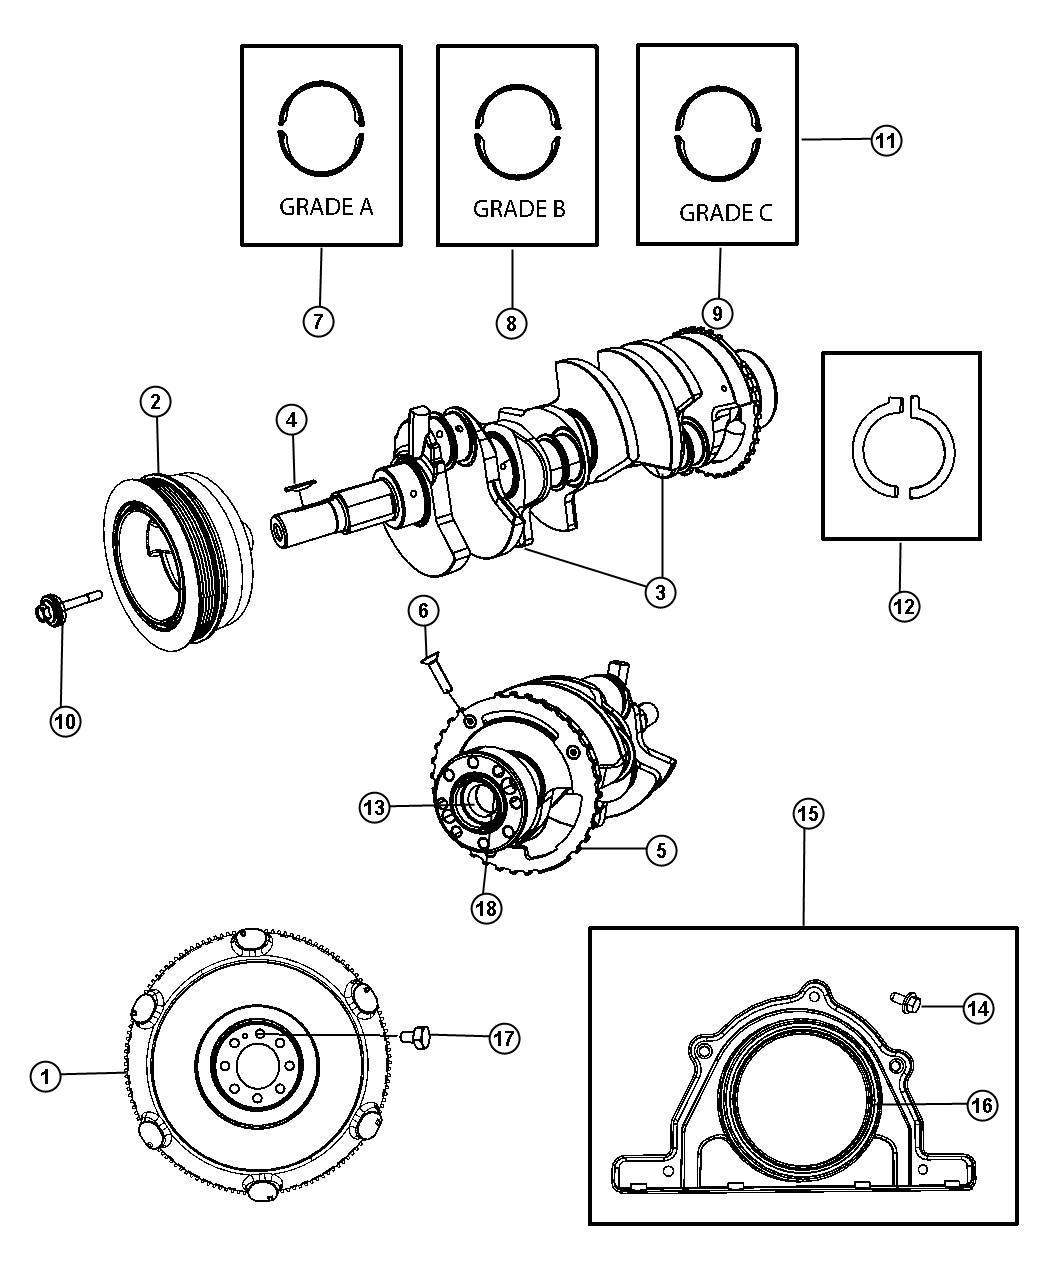 Dodge Challenger Flywheel. Manual transmission, ring gear